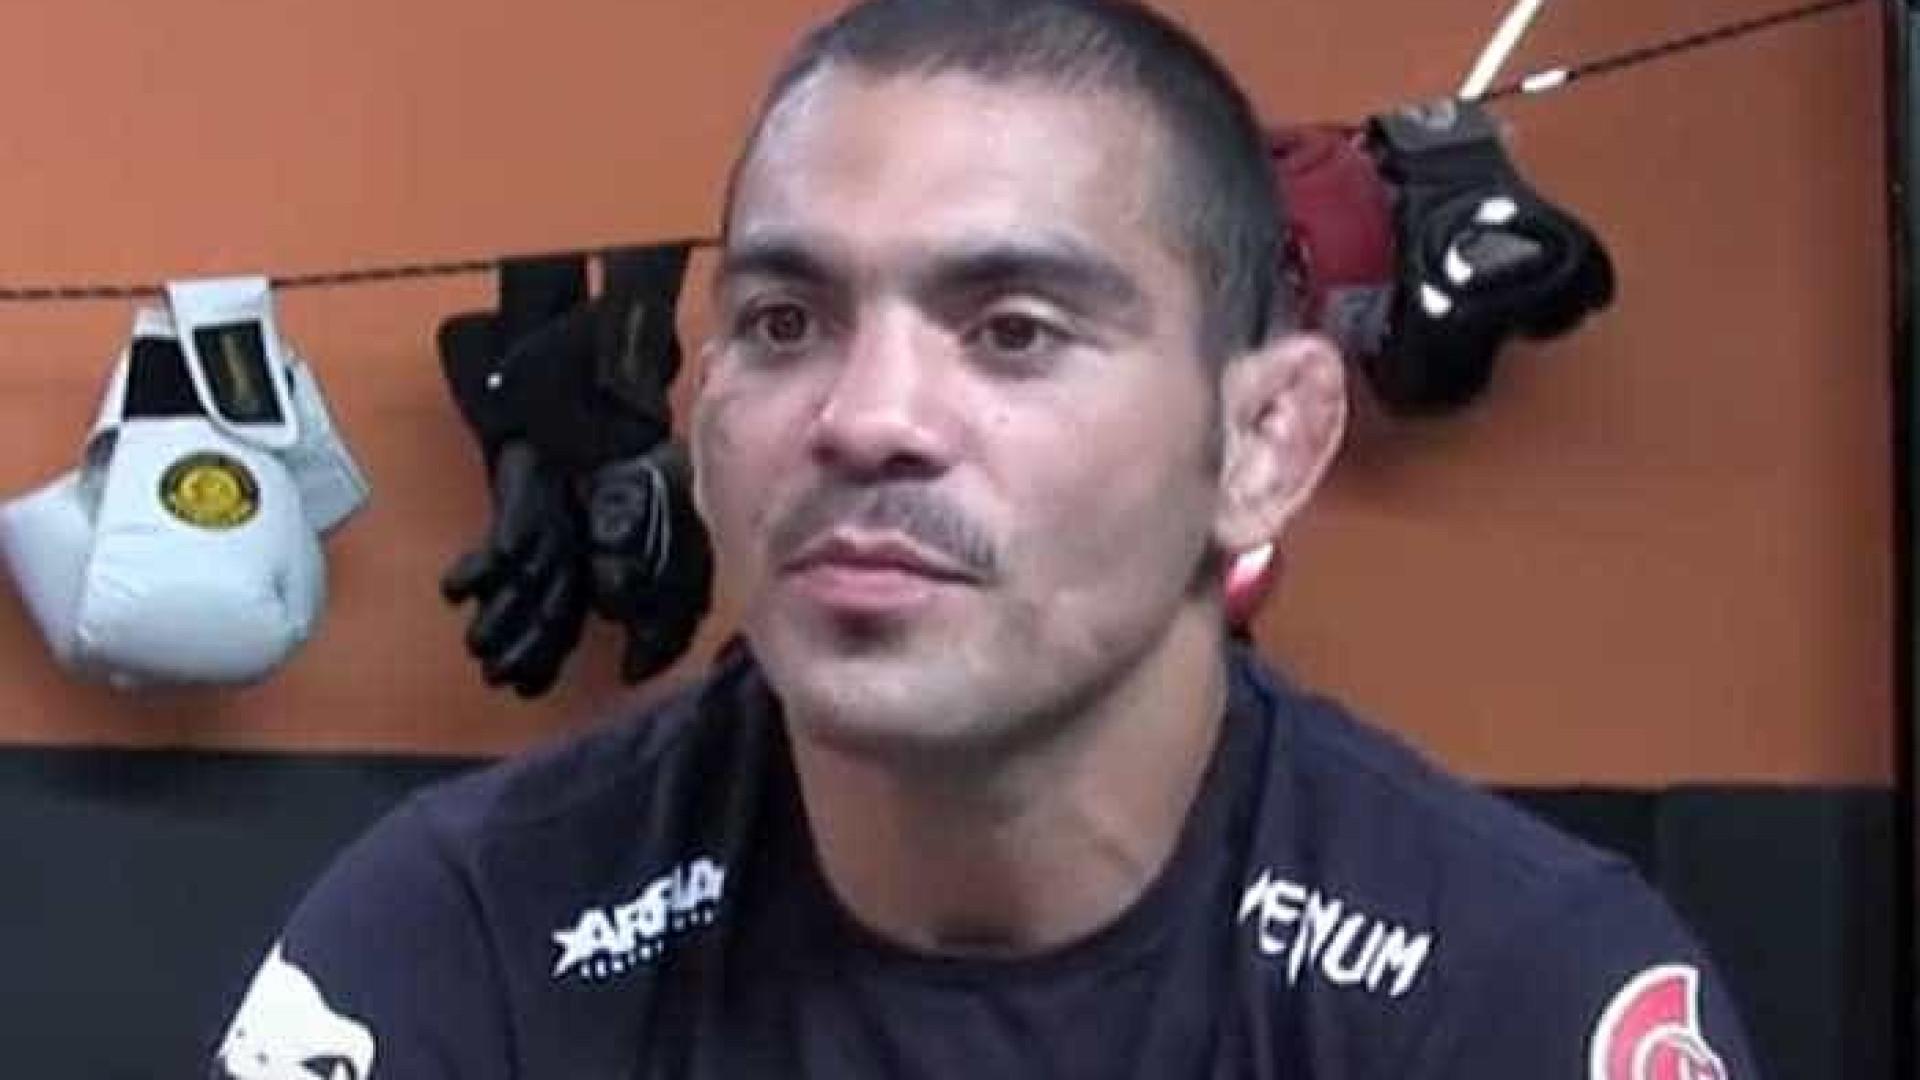 Lutador brasileiro sofre grave acidente e anuncia aposentadoria